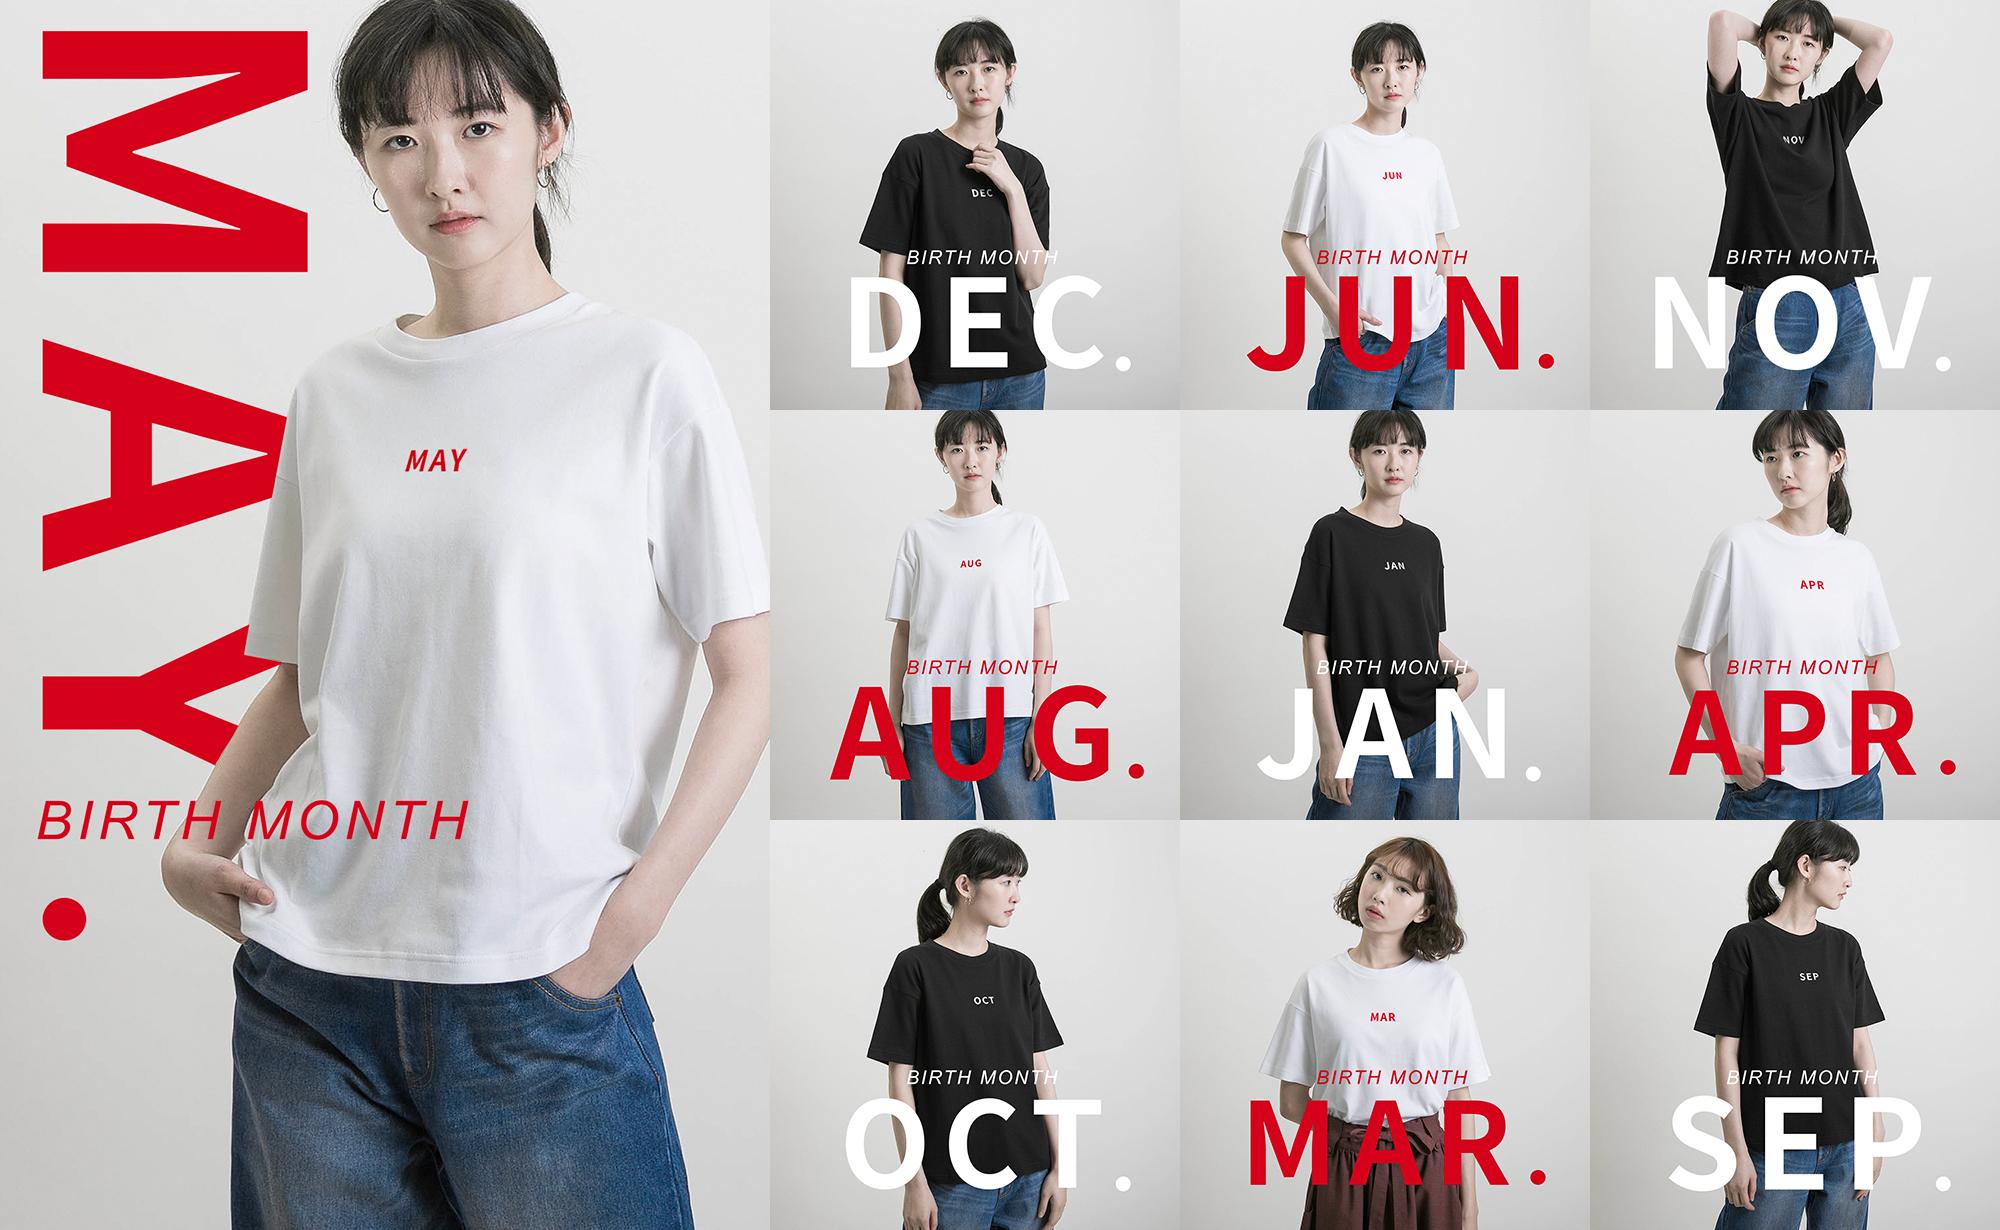 SU:MI said 台灣原創,設計師品牌,設計服飾,配件,台灣製造。